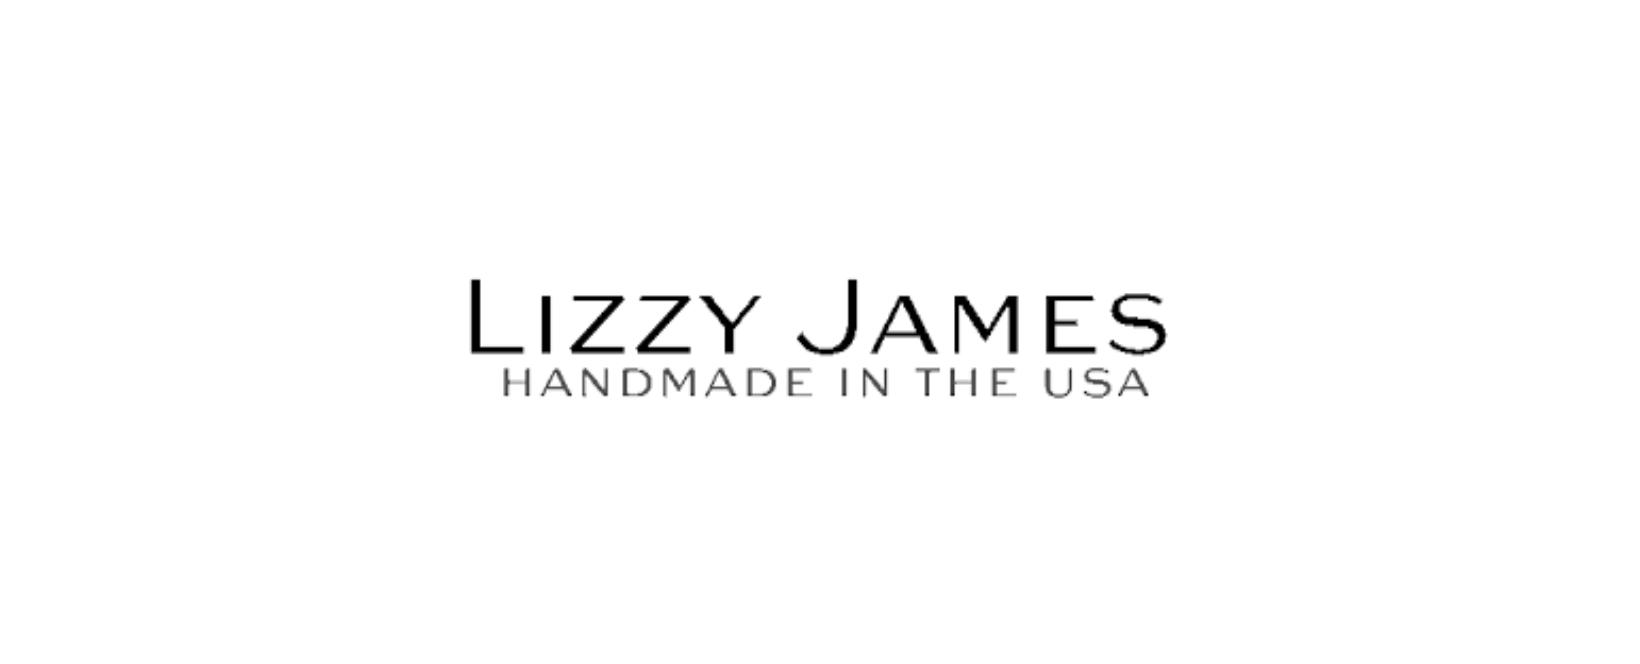 Lizzy James Discount Code 2021